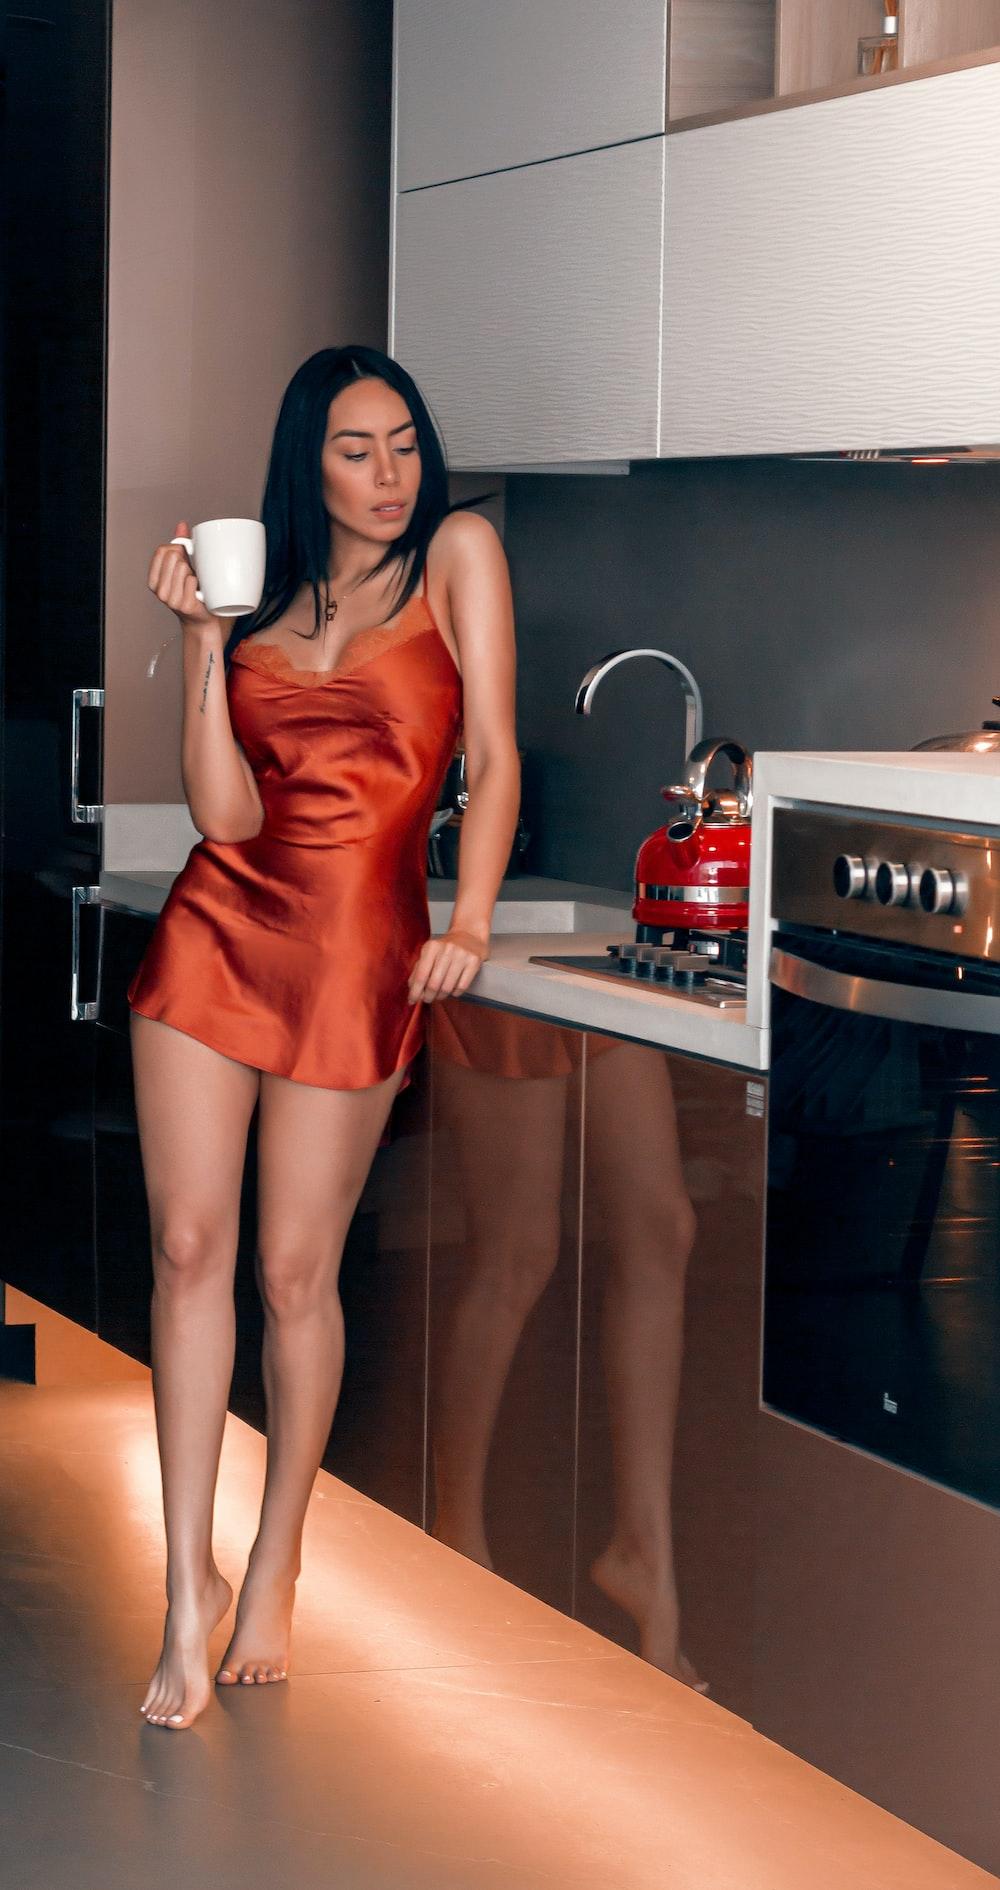 woman in red mini dress holding white ceramic mug